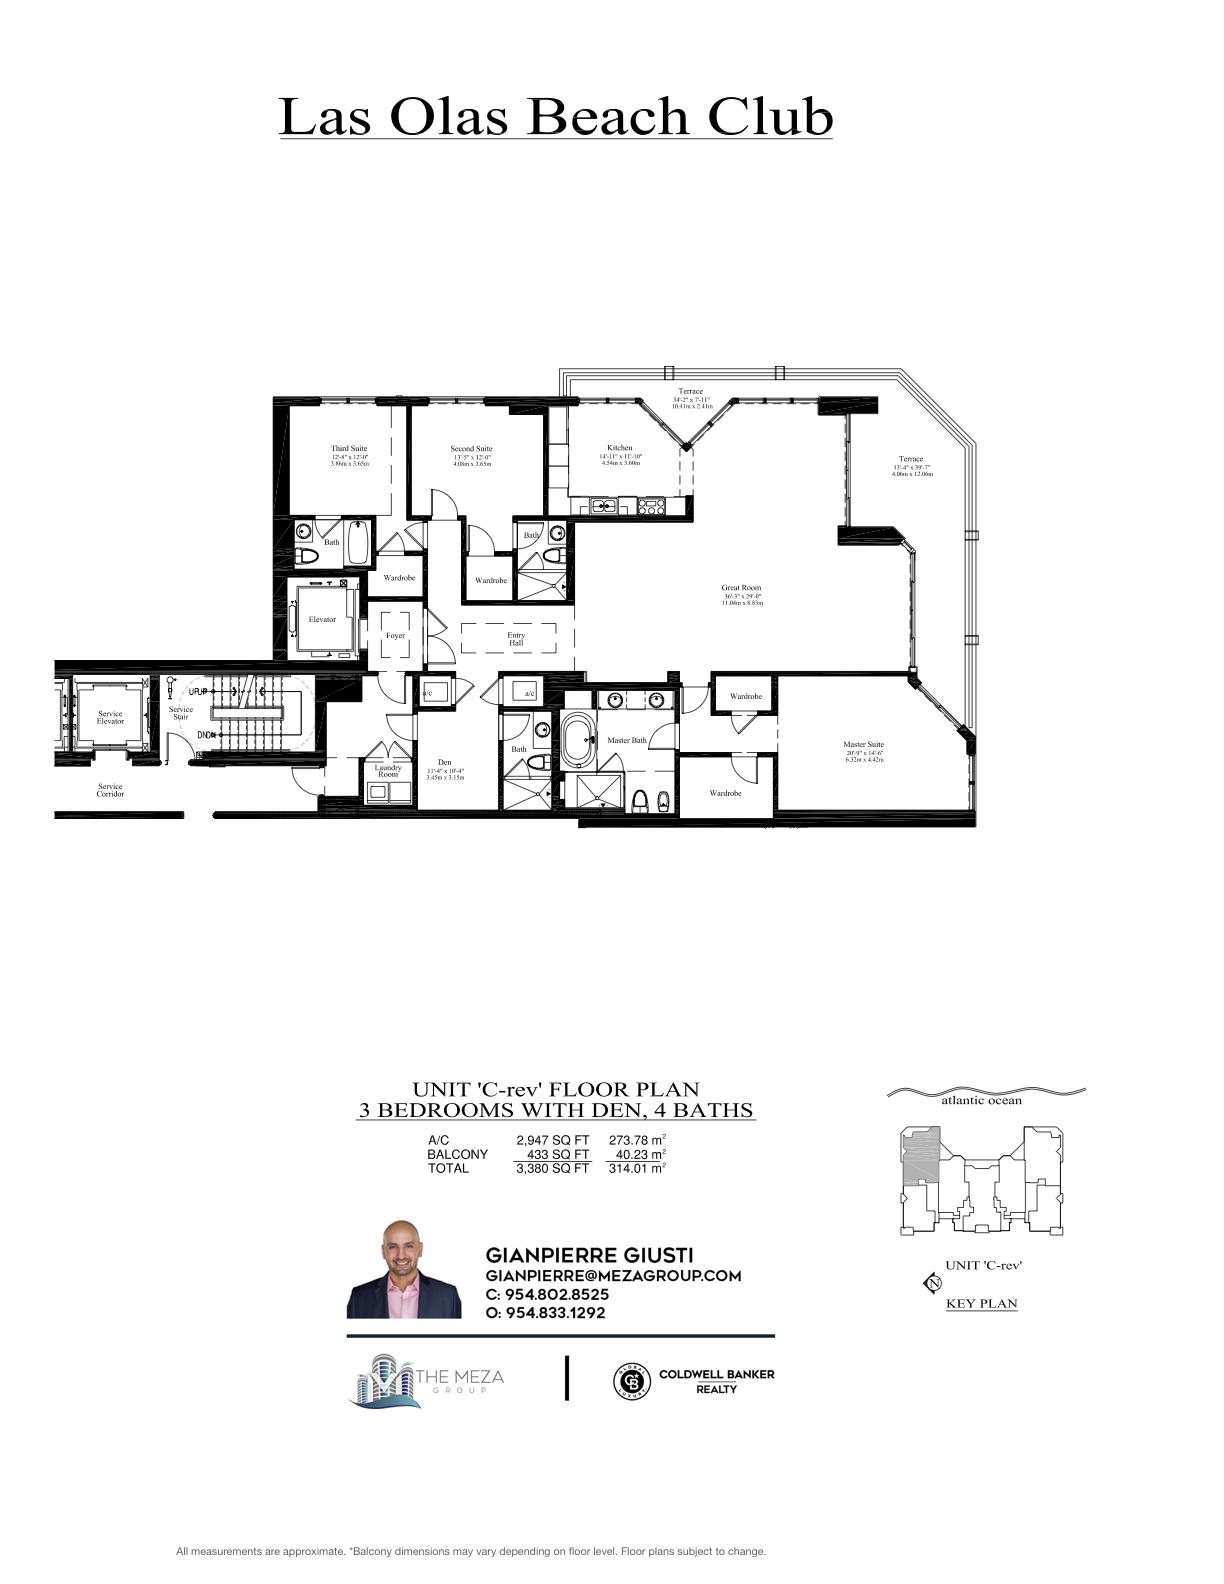 Las Olas Beach Club Model 'CR', '05' Line Floor Plan